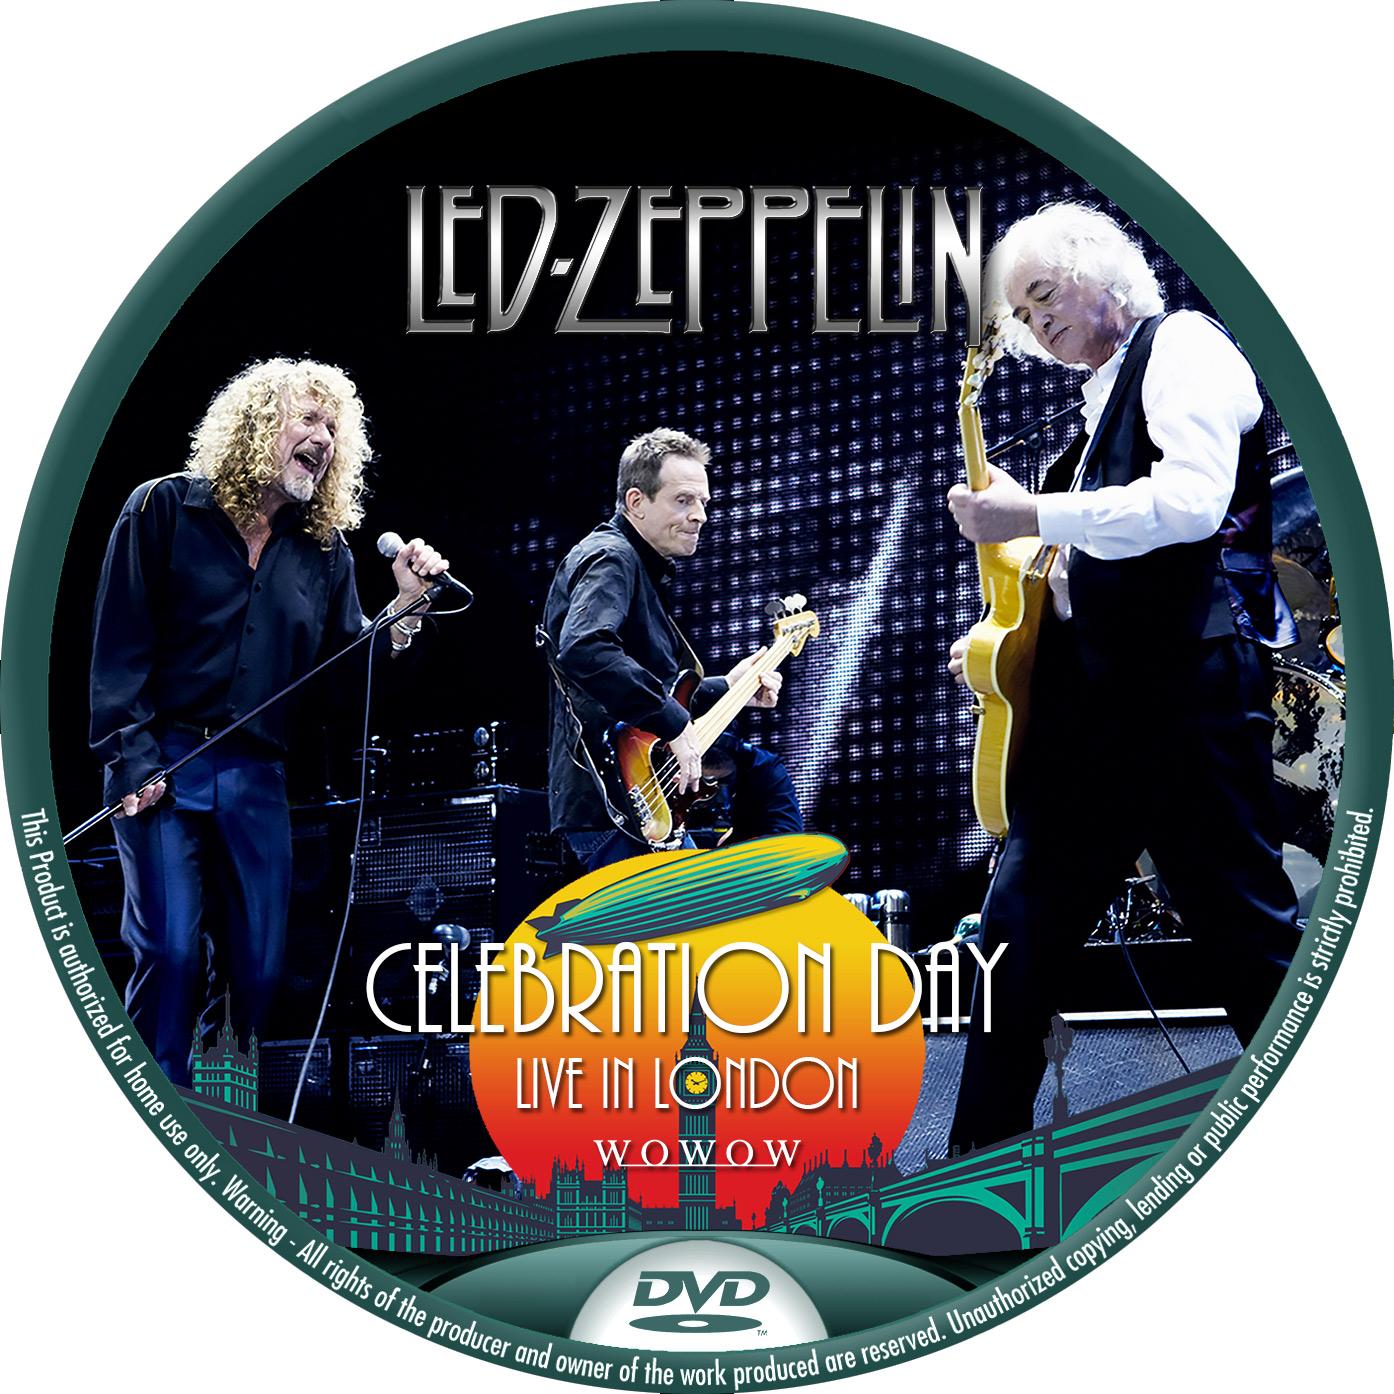 LED ZEPPELIN ライブ DVDラベル